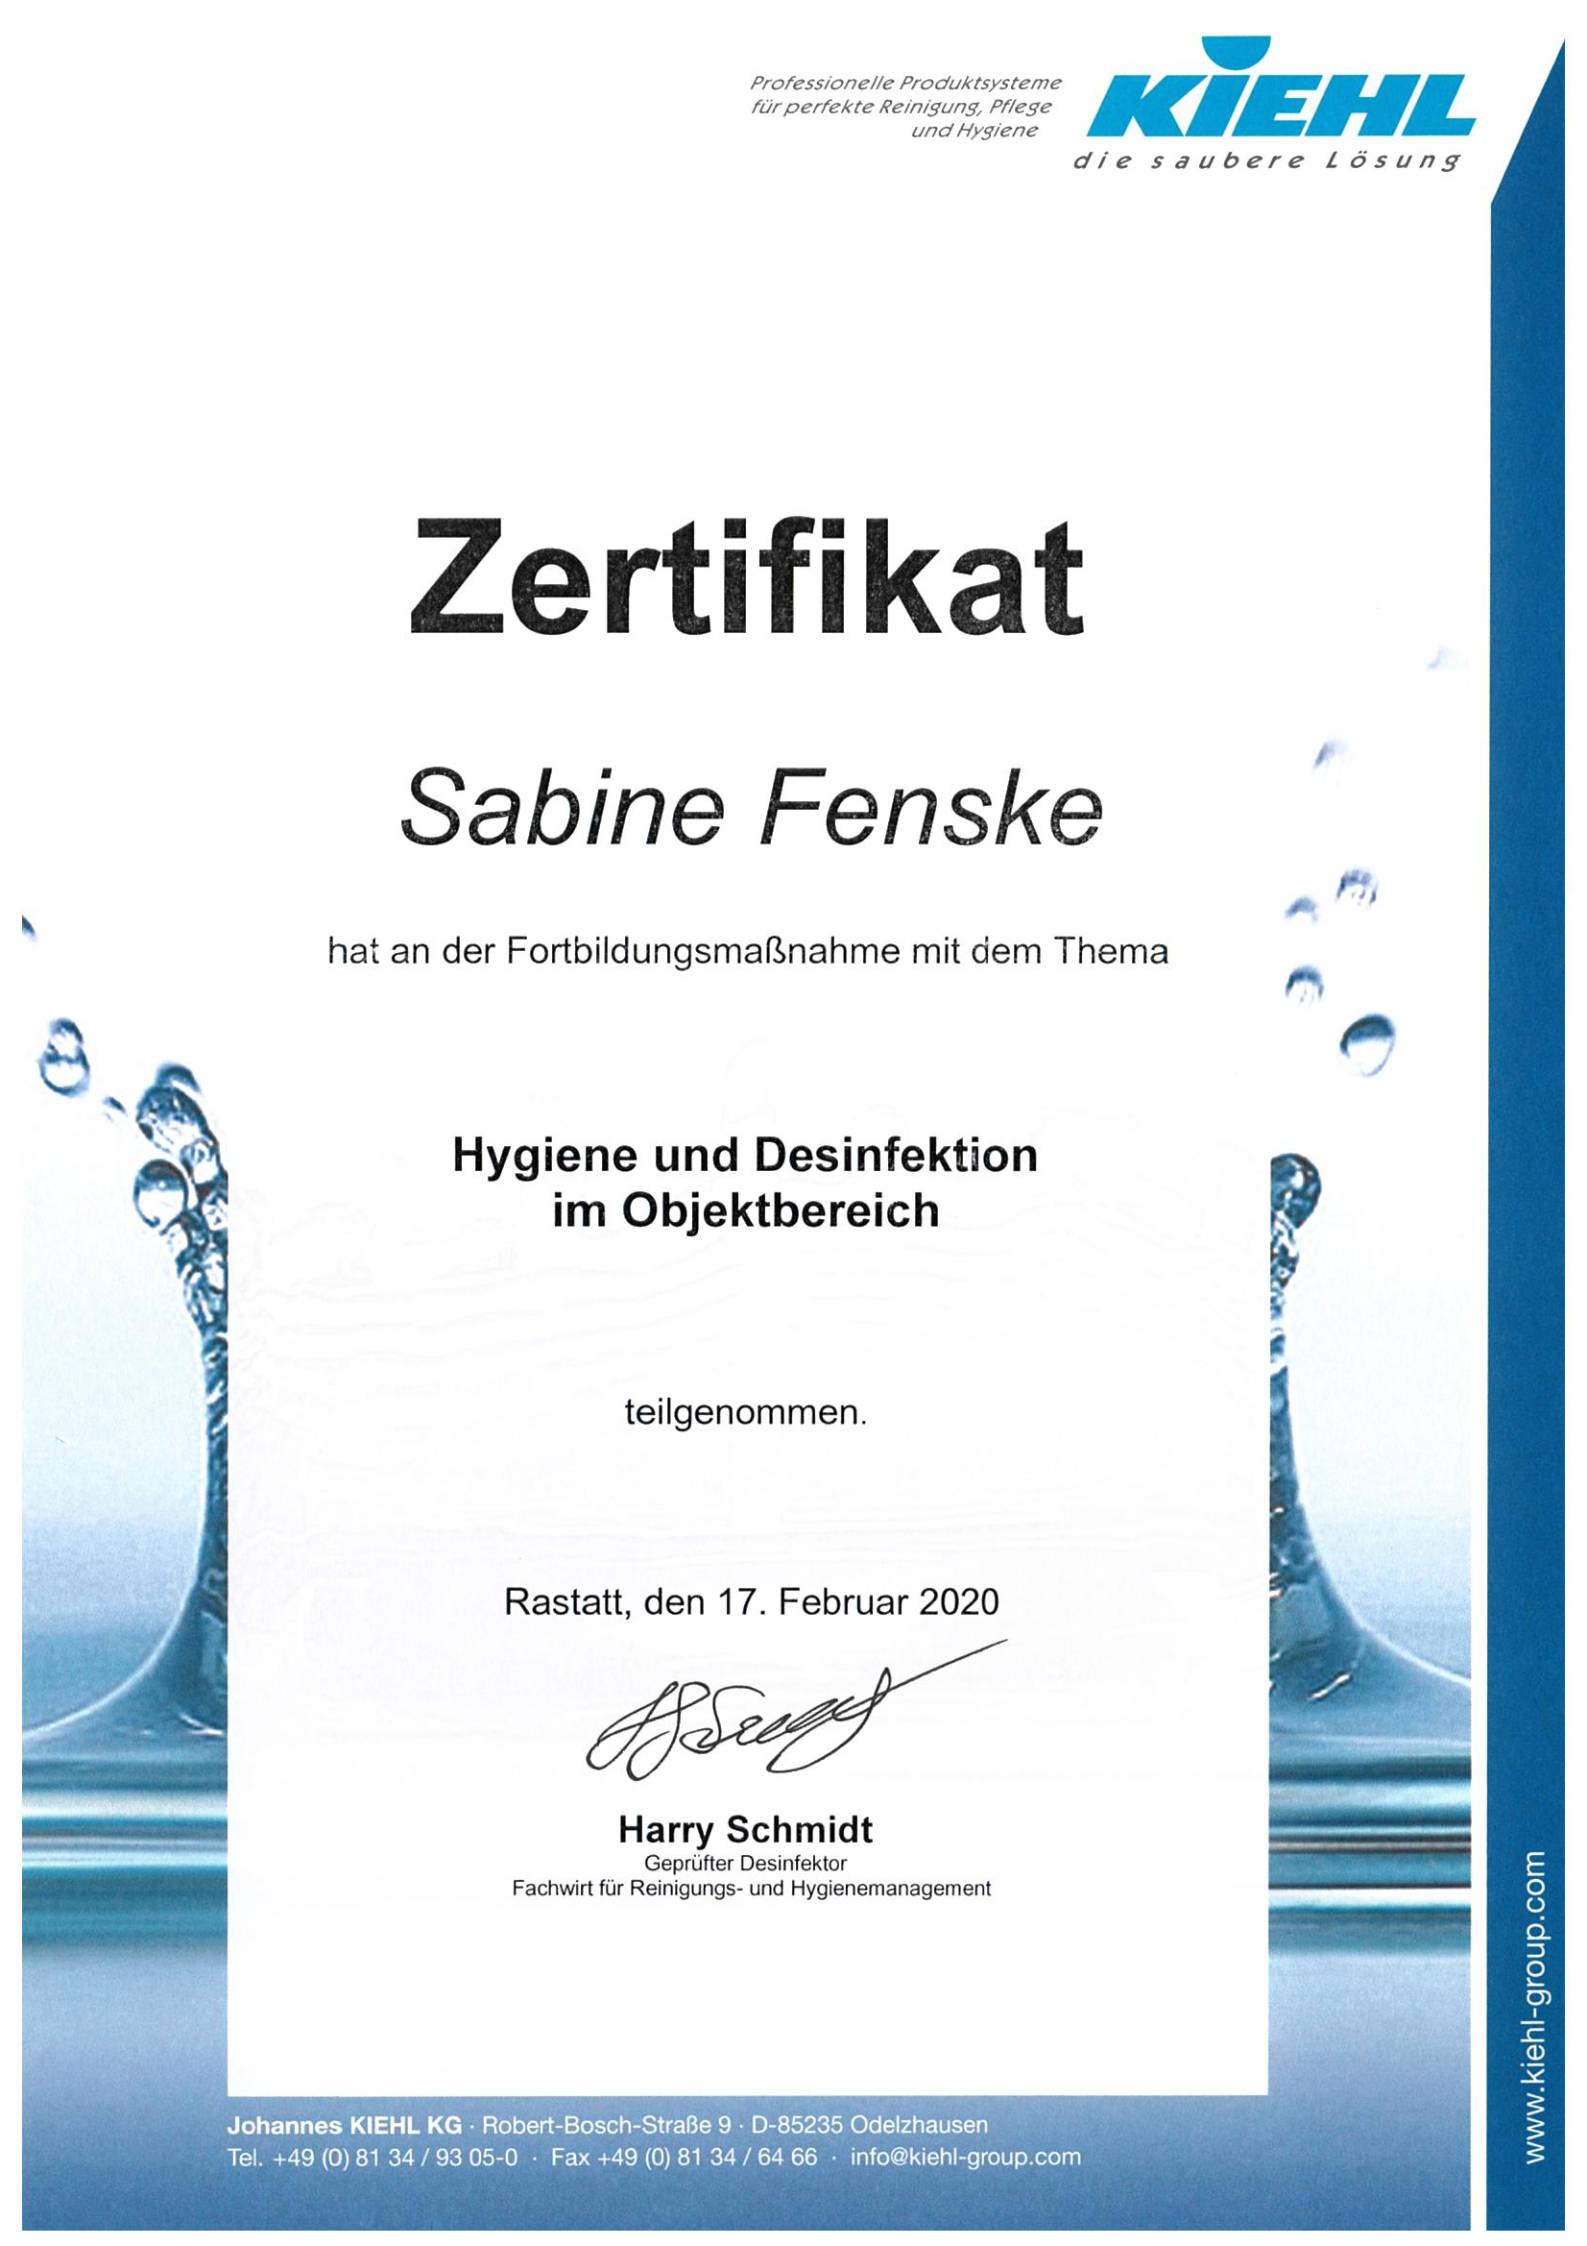 kiehl desinfektion zertifikat